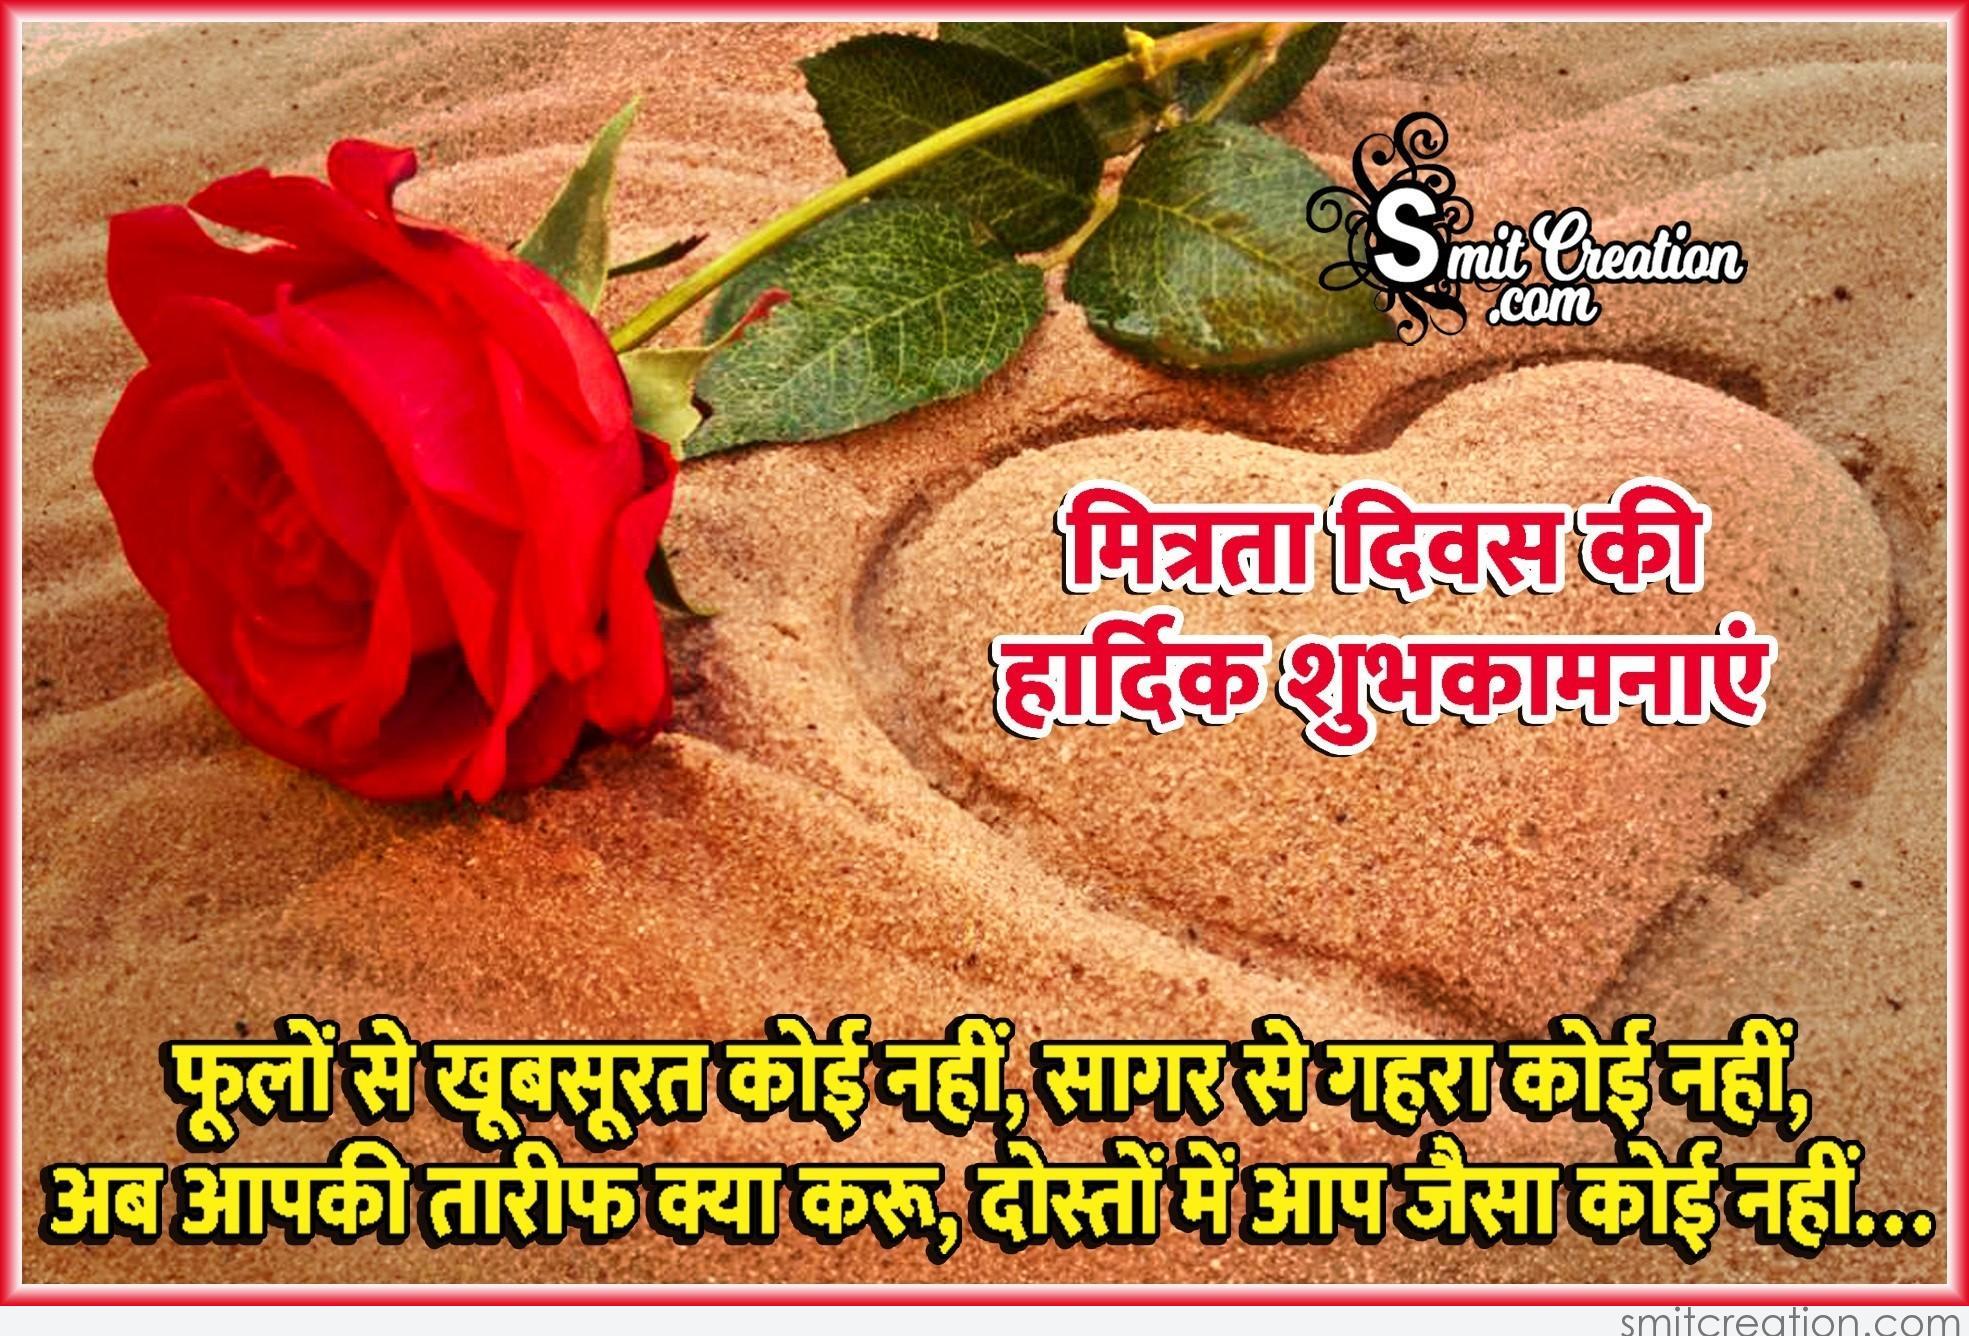 friendship day wishes in hindi image - smitcreation